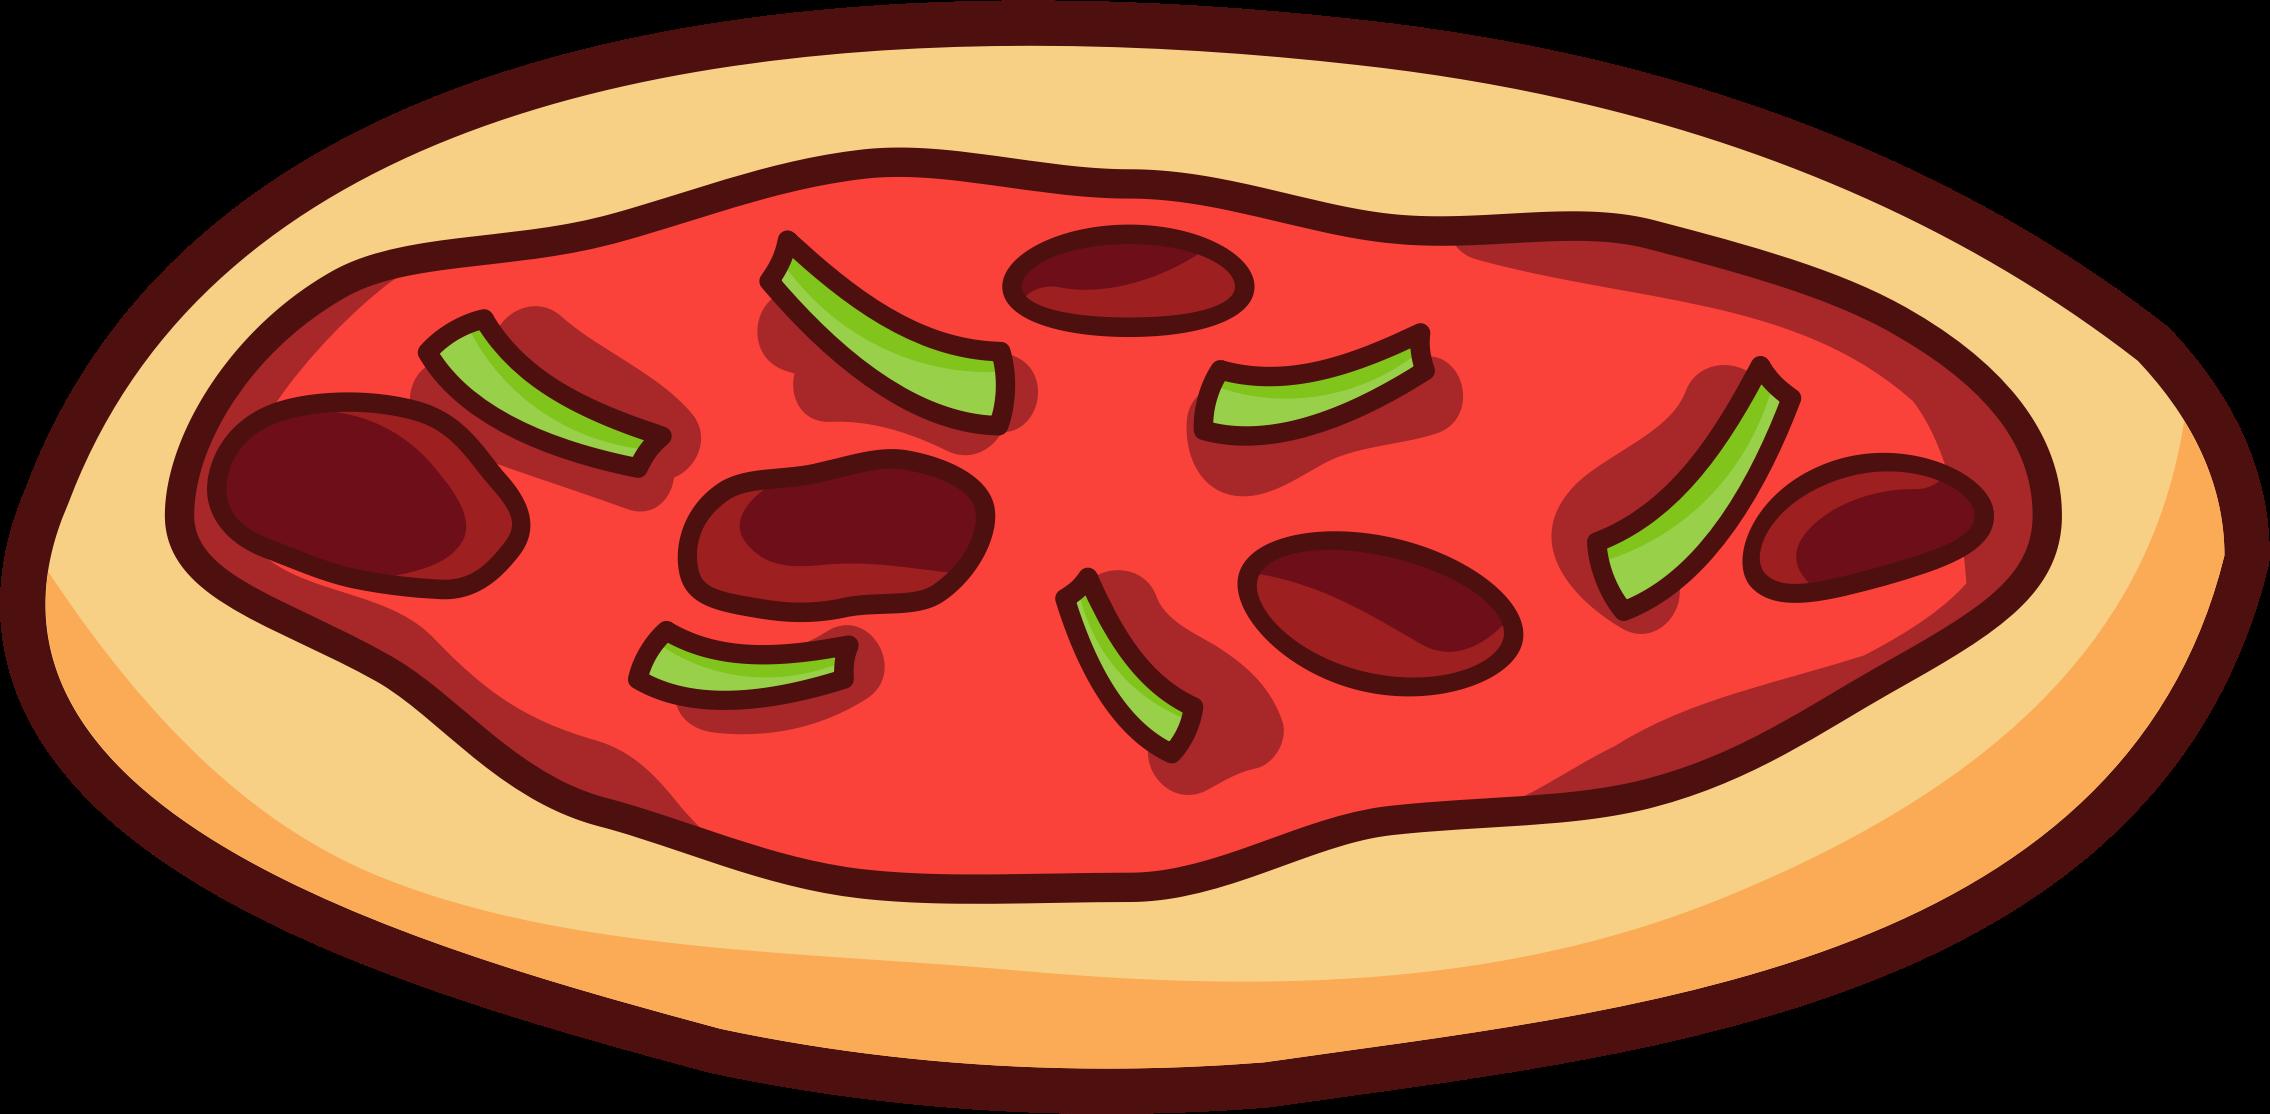 2270x1114 Big Pizza Clipart, Explore Pictures